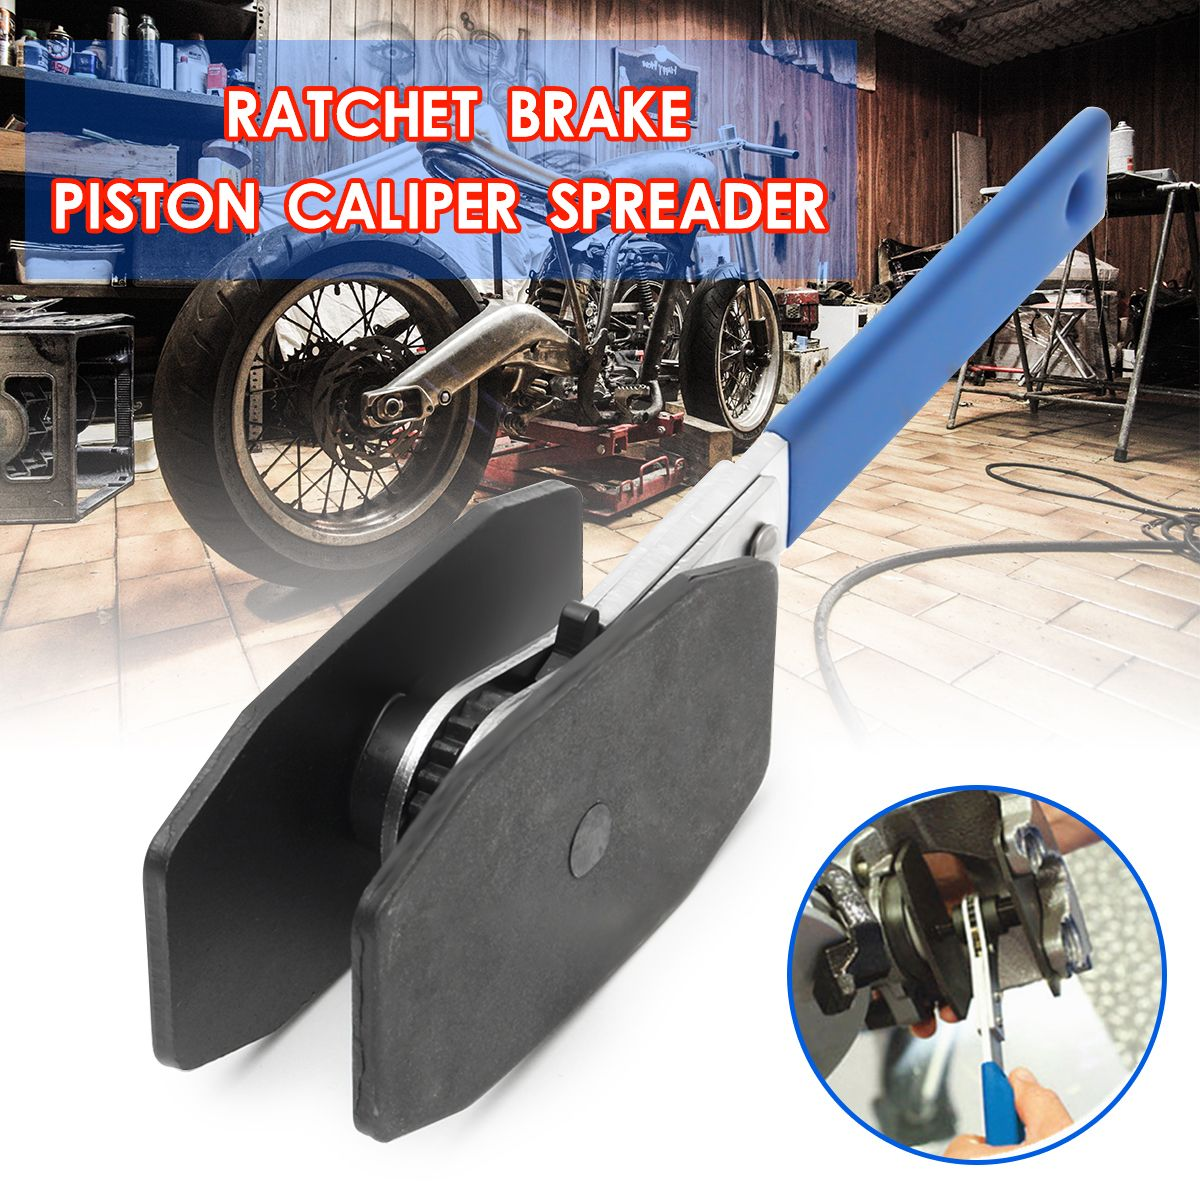 2018 Universal Car Ratchet Brake Piston Caliper Spreader Tool Brake Caliper Press Twin Quad Separator Pad Install Tool